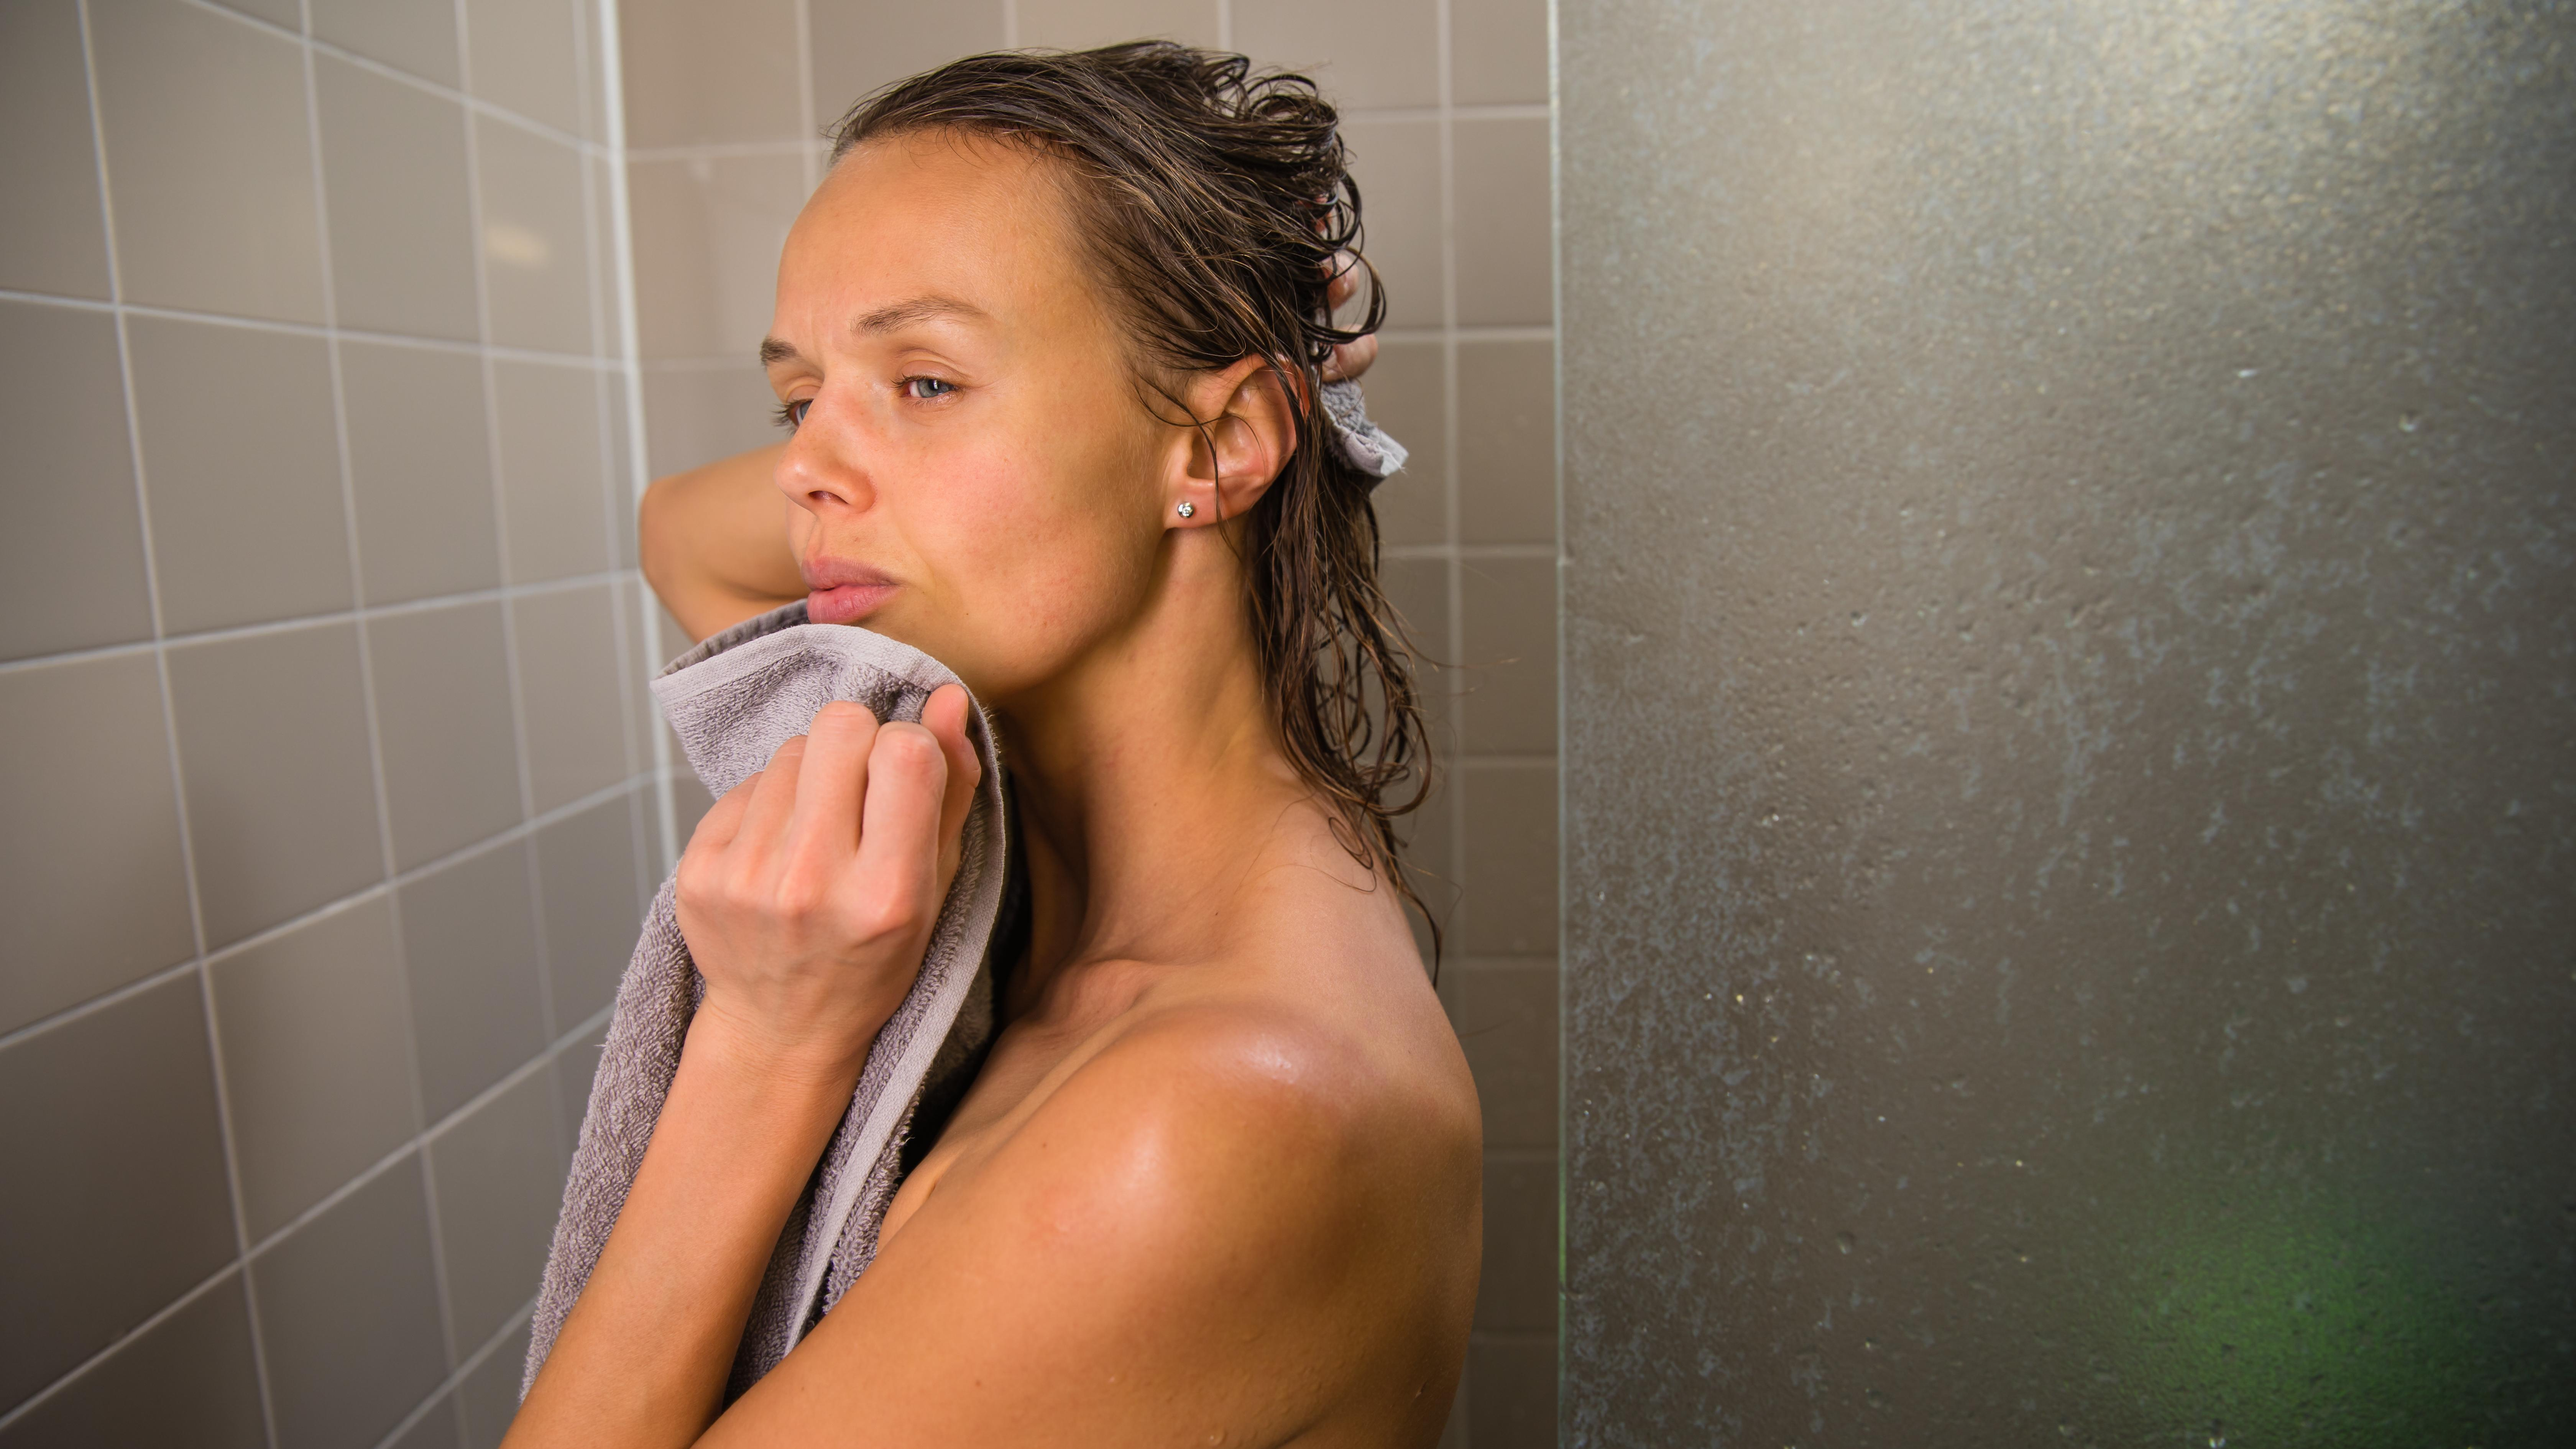 Festes Shampoo selber machen - so geht's